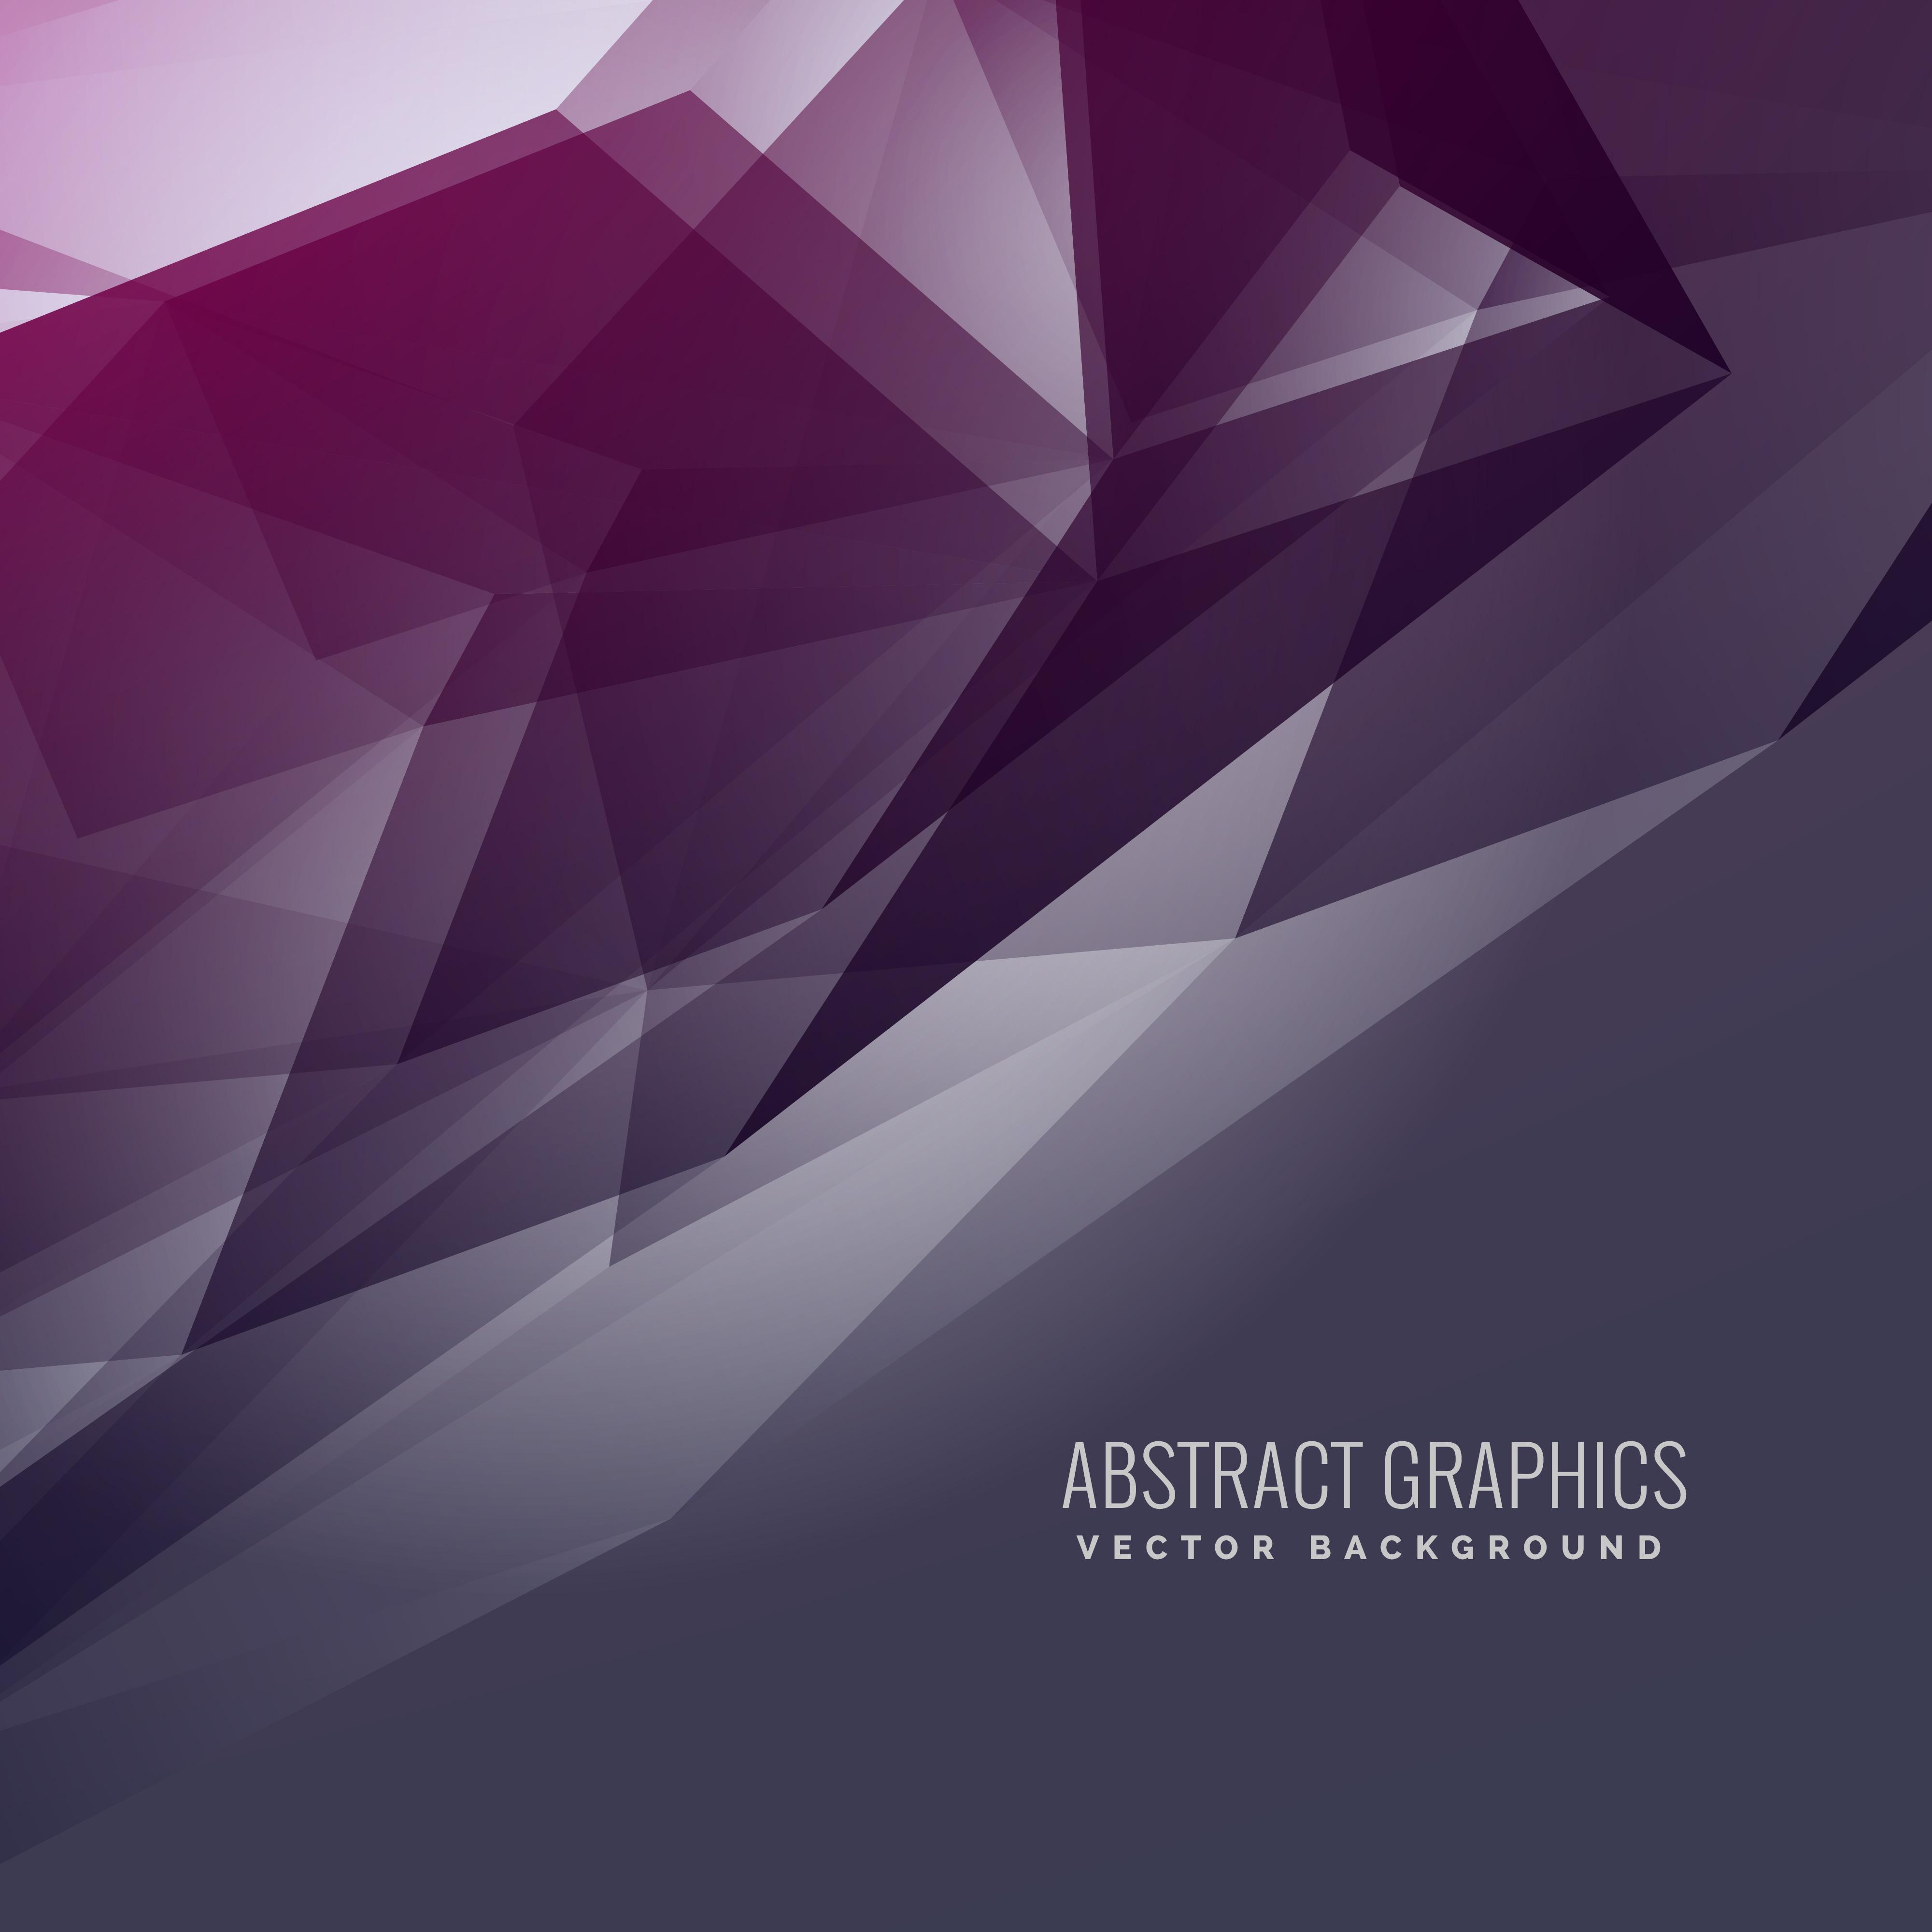 Abstract Futuristic Purple Background In Dark Style